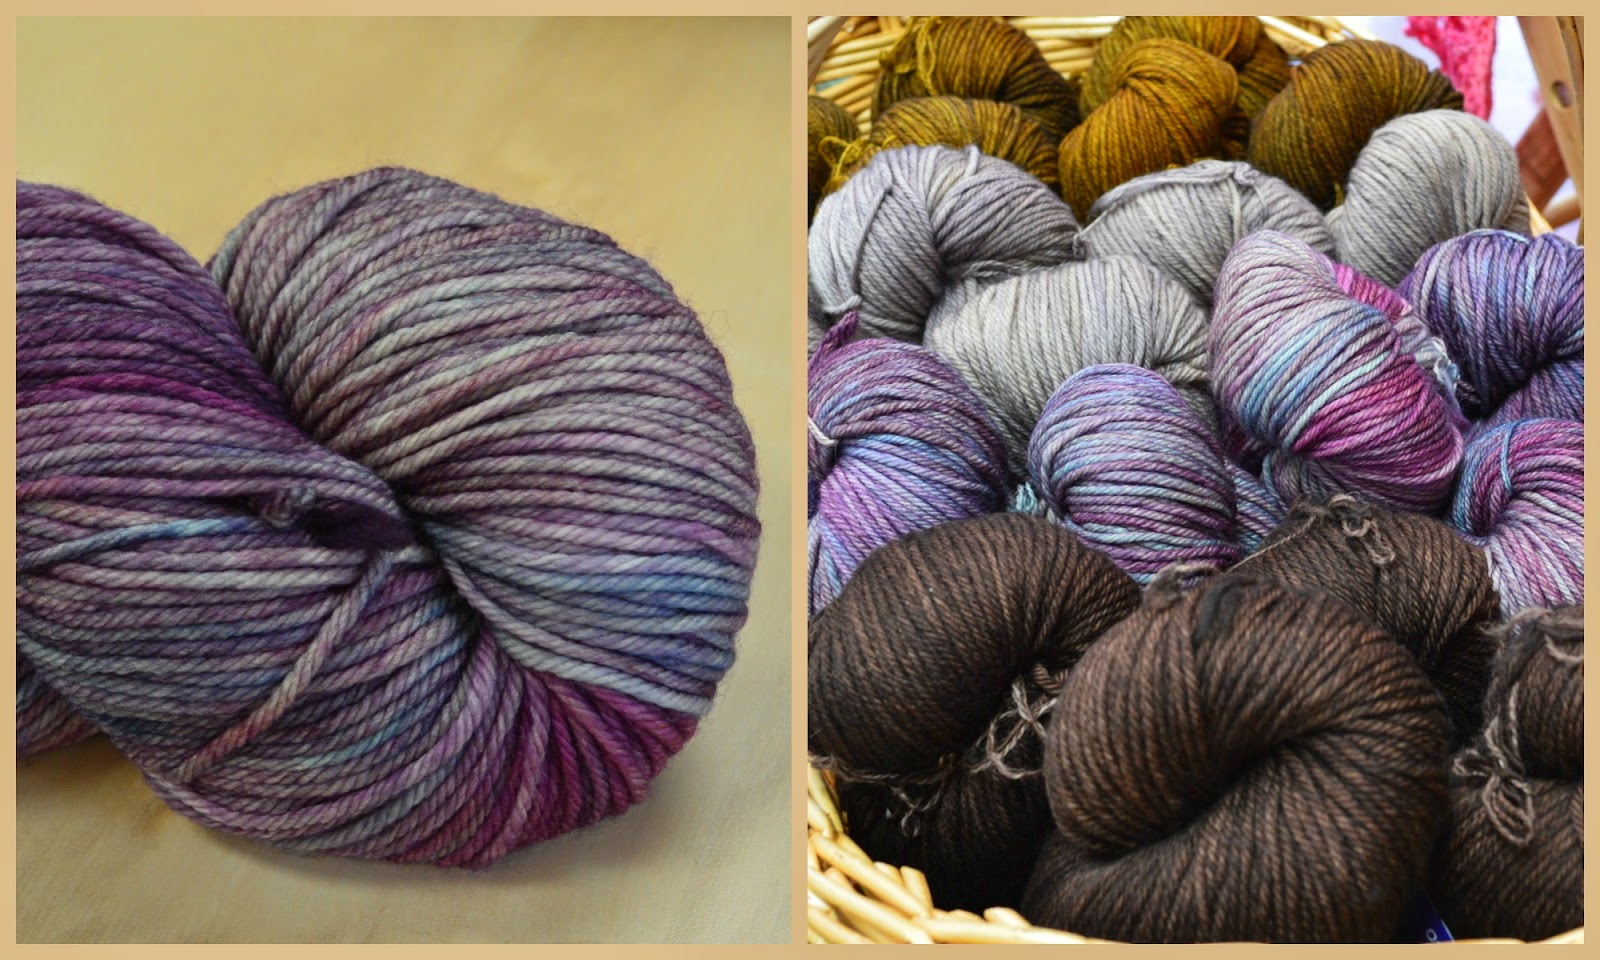 Tangled Purls, fine yarn studio: September 2014